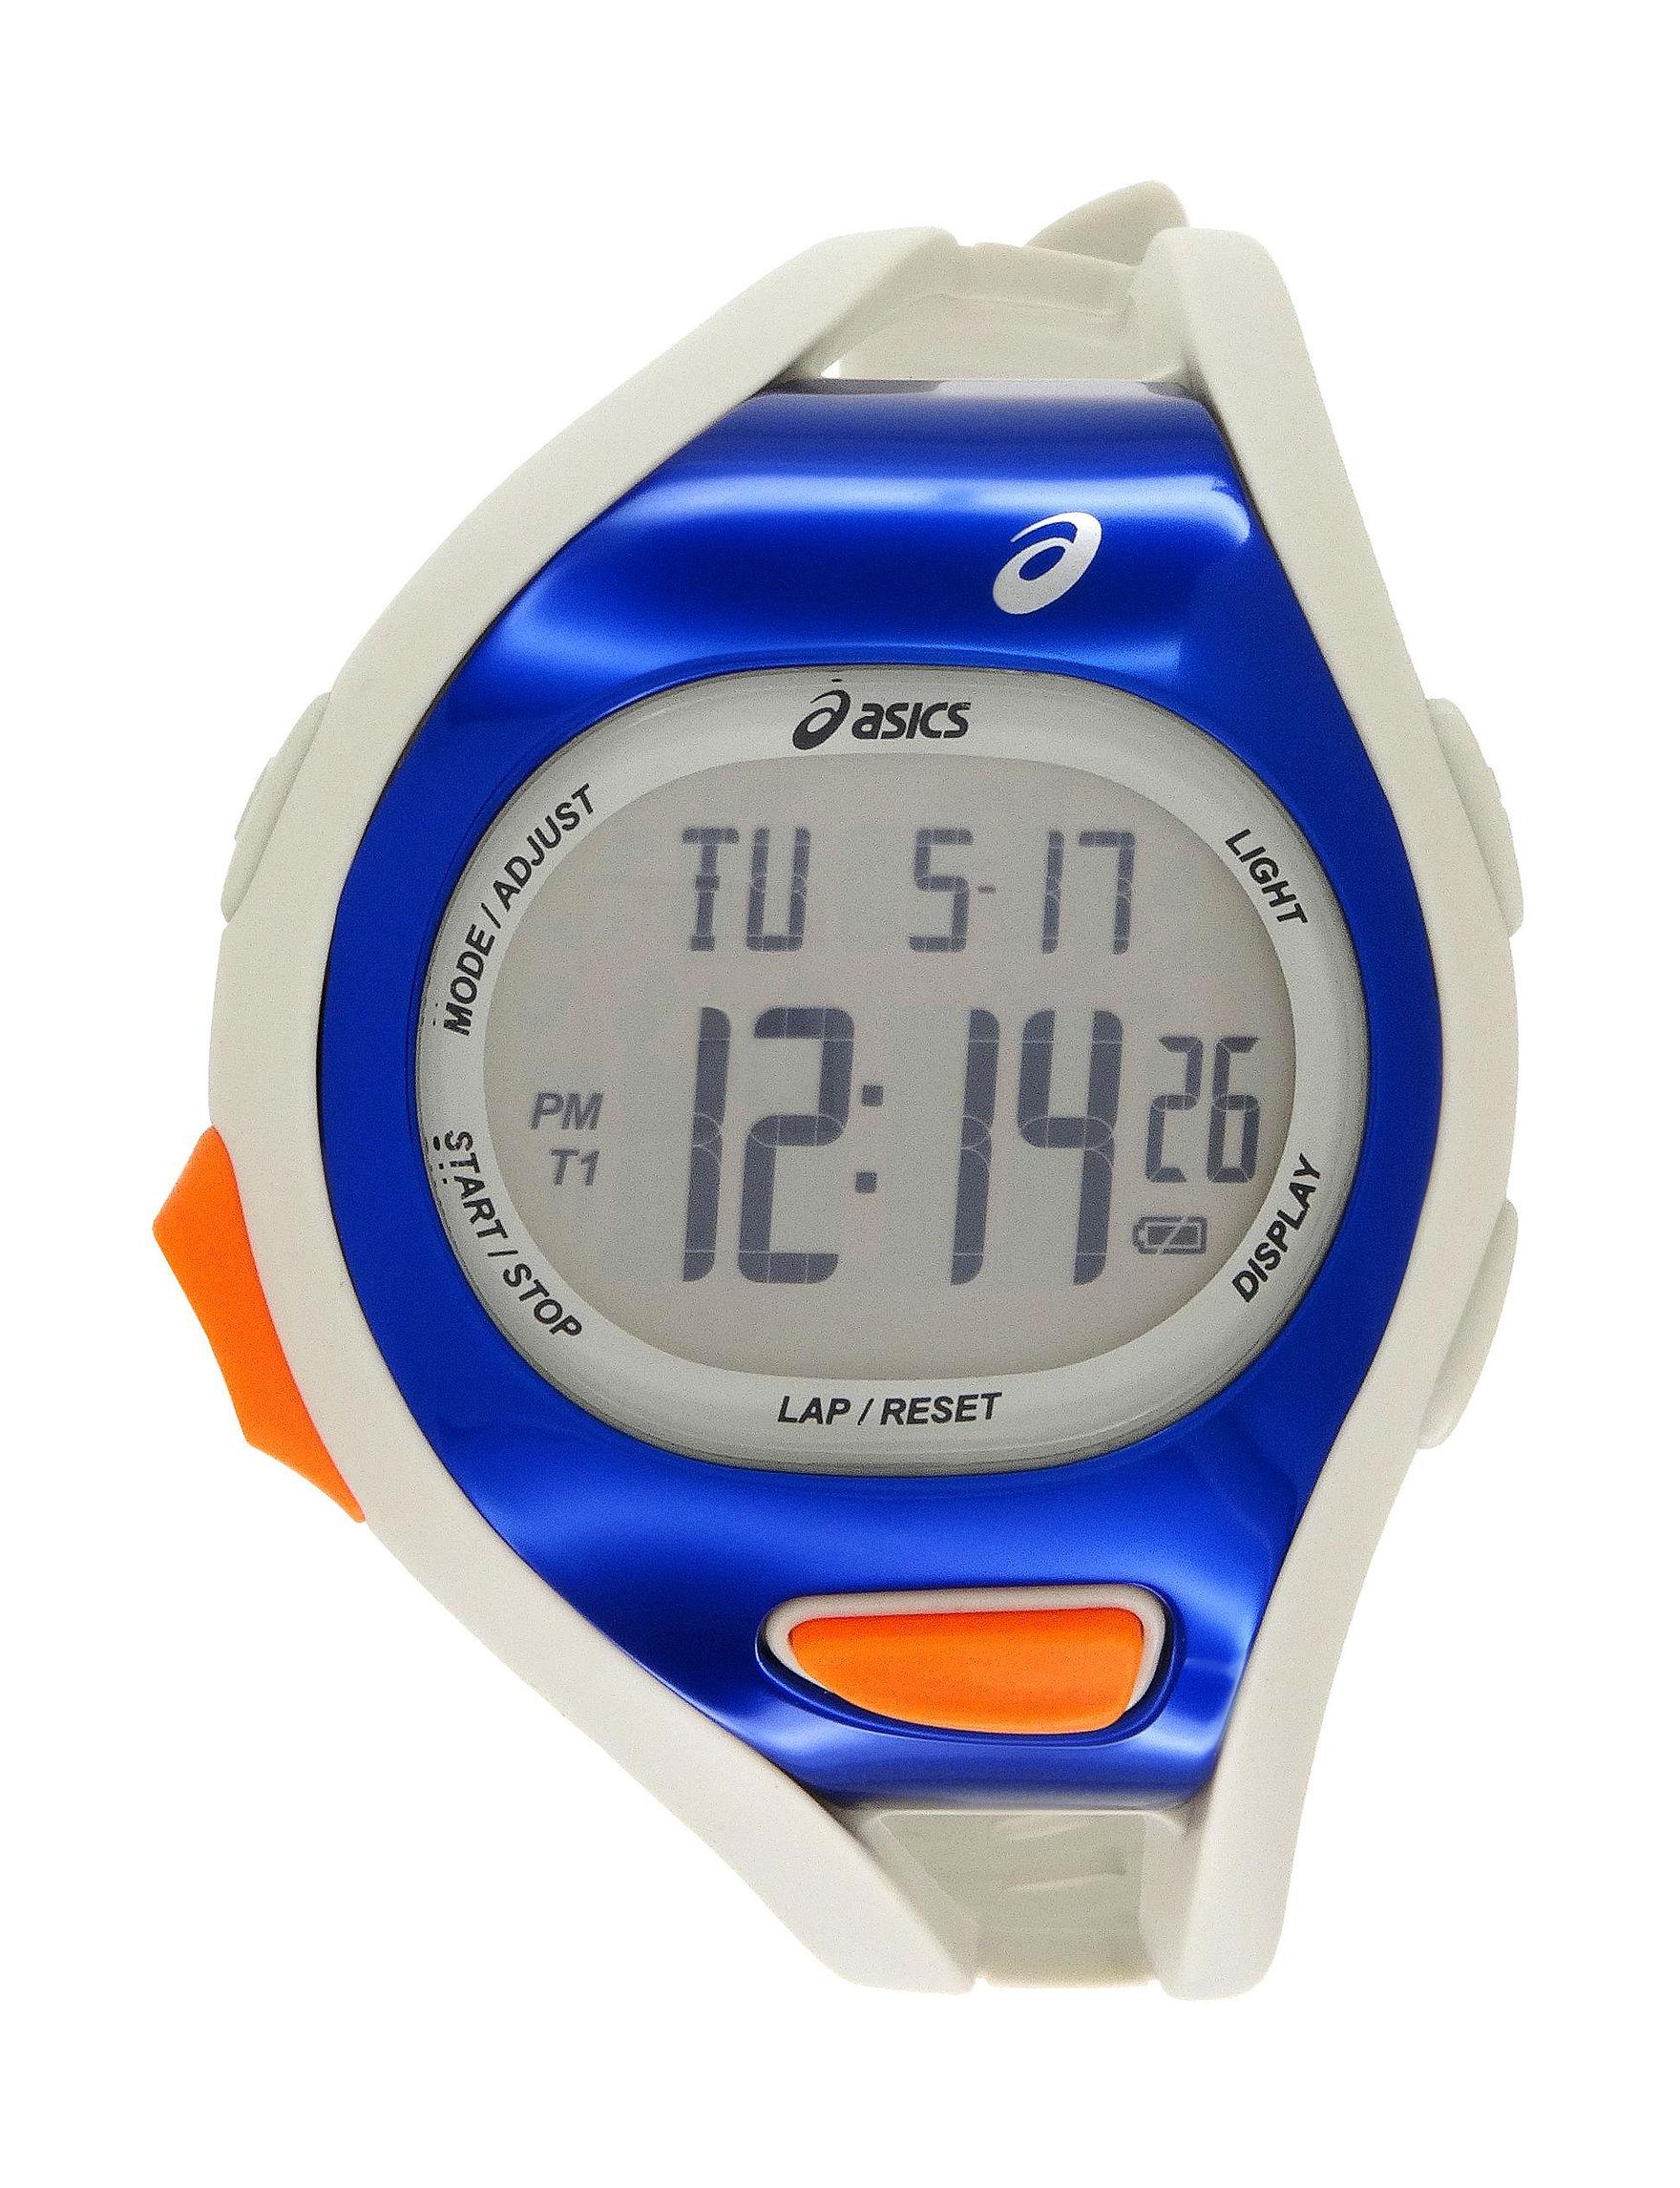 Asics White / Blue Sport Watches